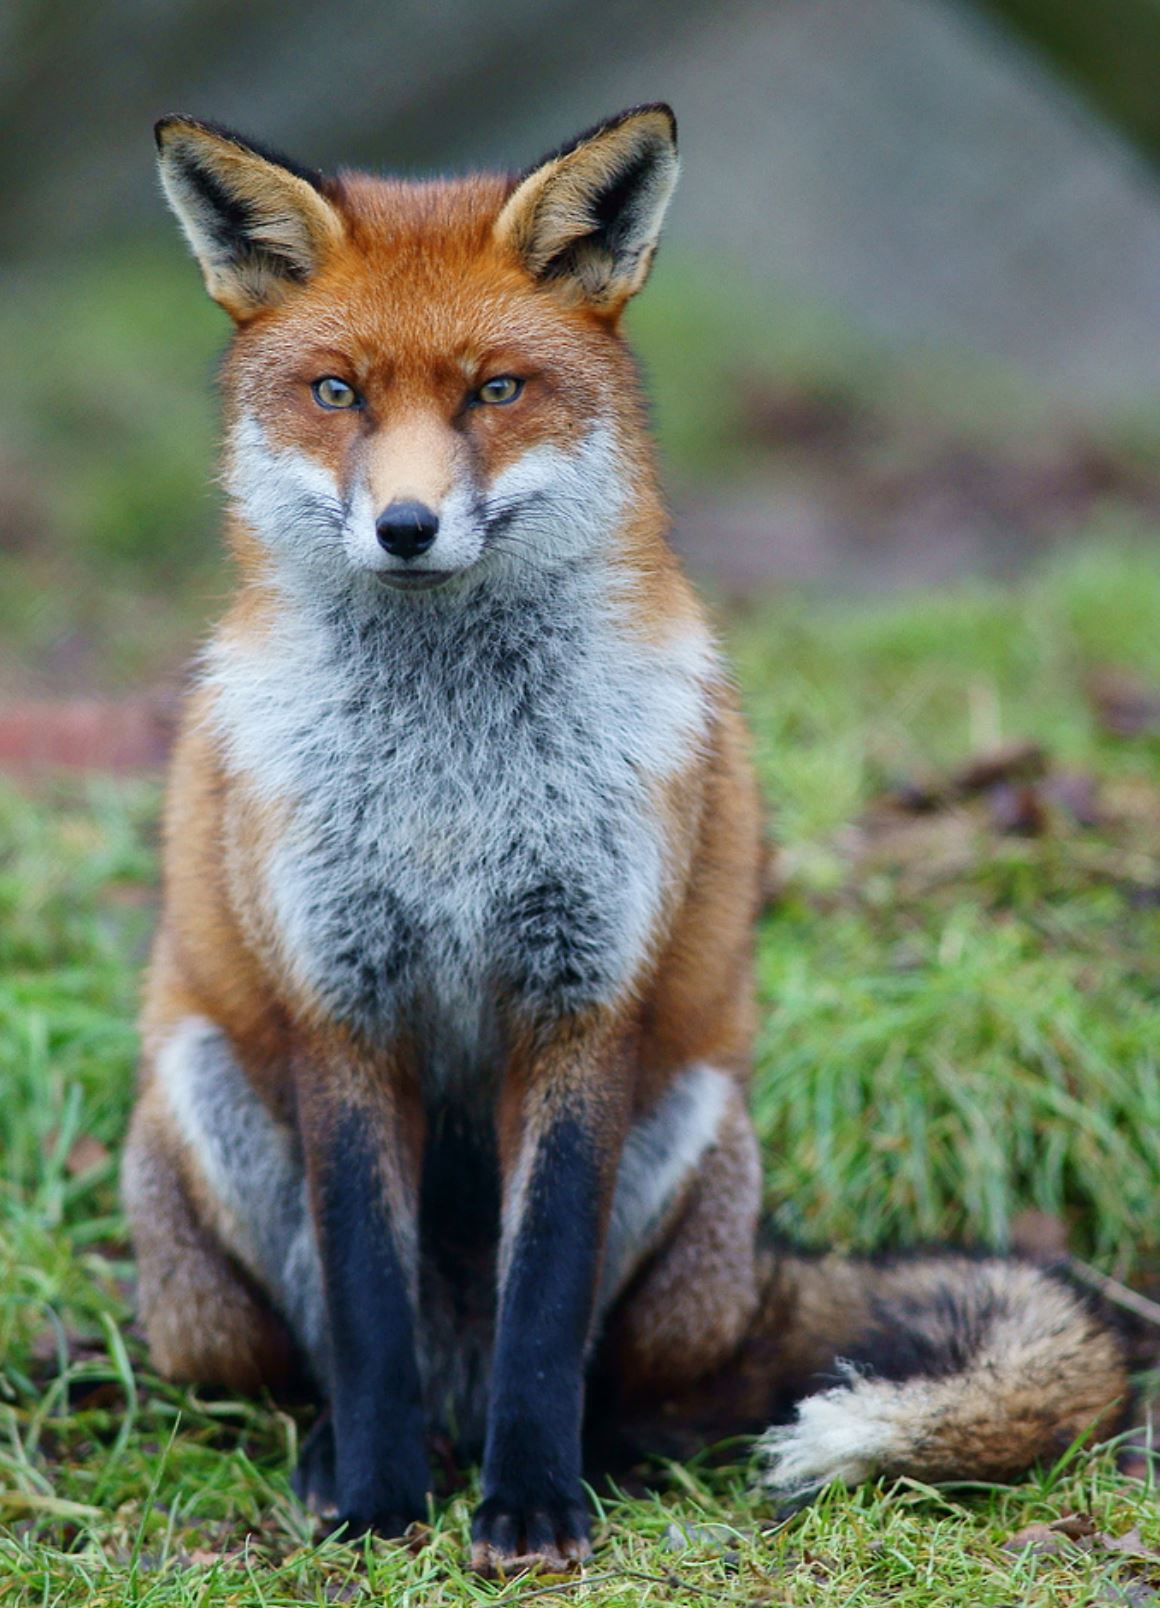 renard roux fox poil fur flytying fly tying mouche streamer eclosion